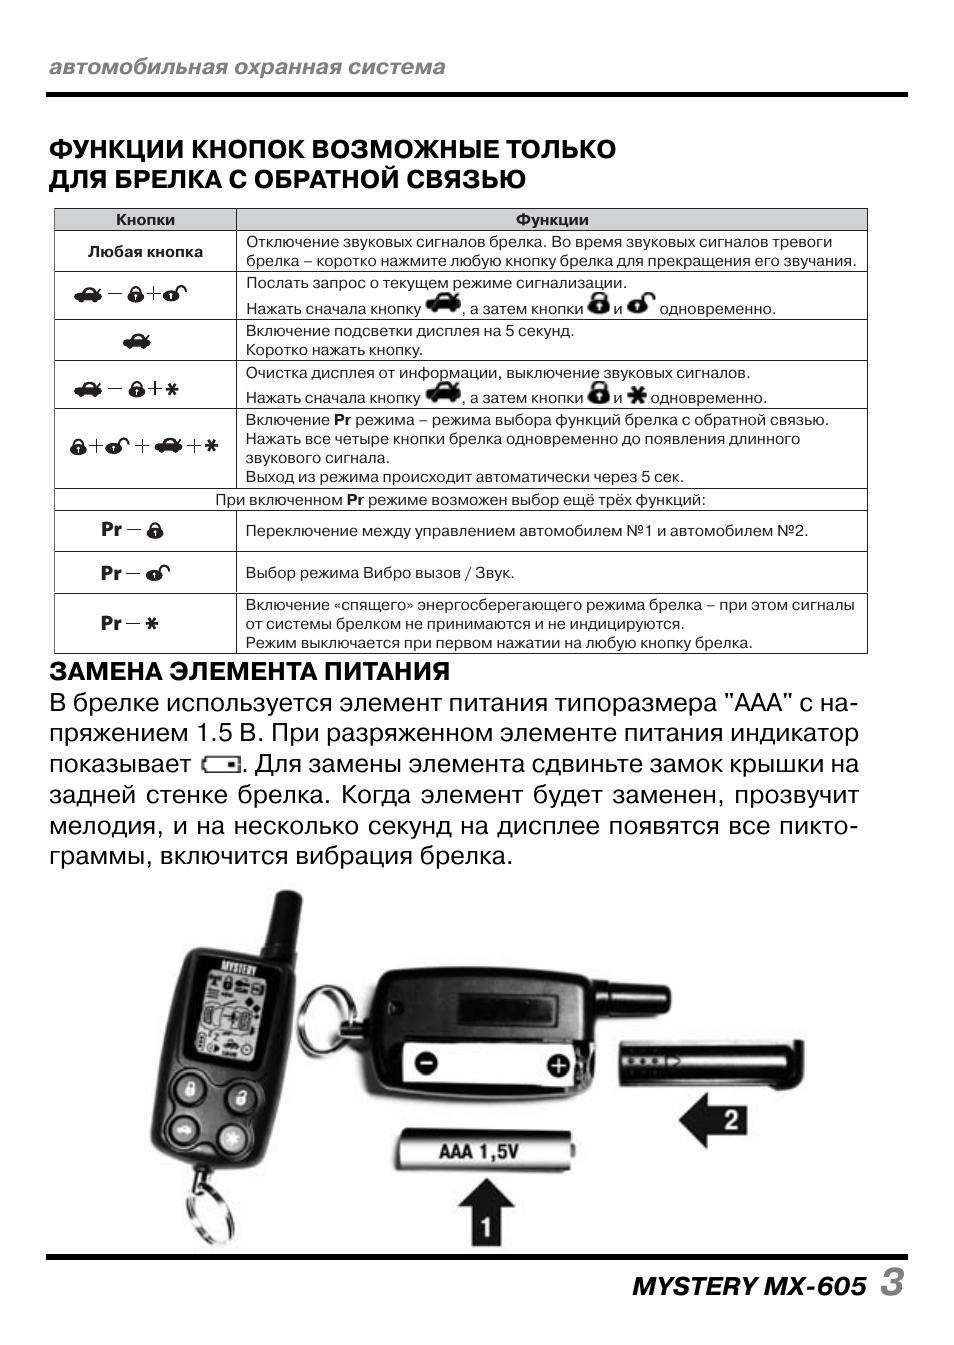 Страница 15/24] инструкция: автосигнализация mystery mx-605.